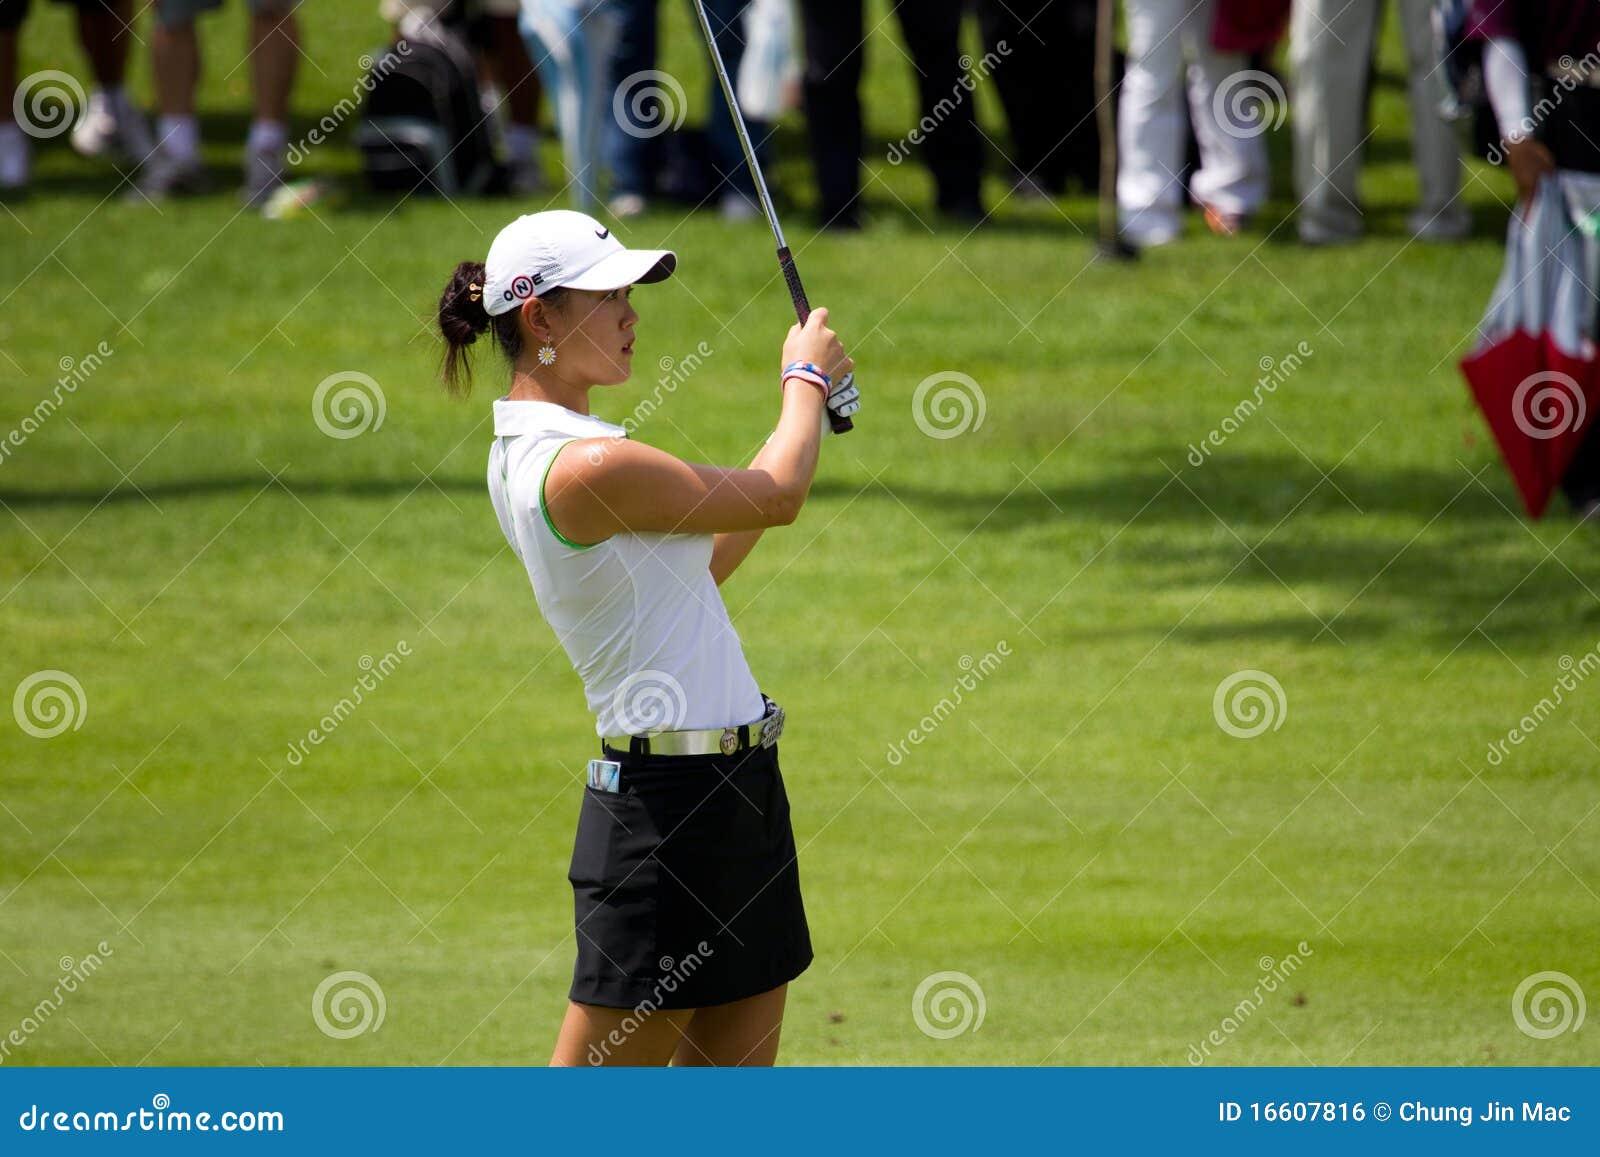 lpga golf swing